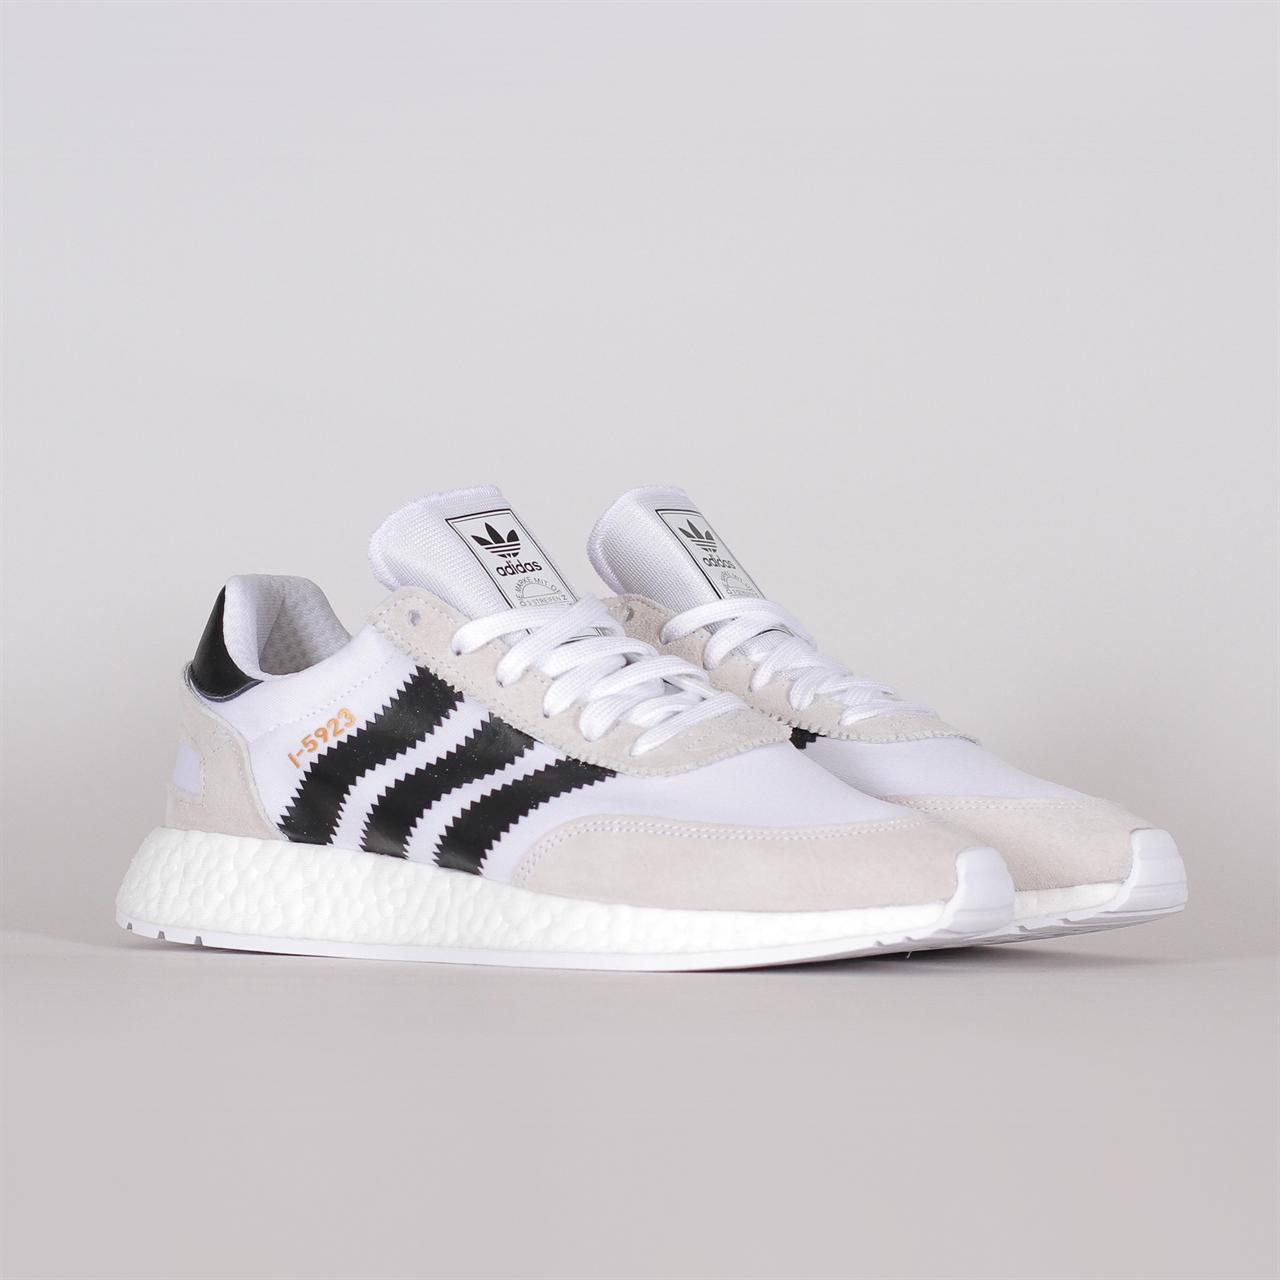 finest selection 85c83 14274 Shelta - Adidas Originals I-5923 (CQ2489)